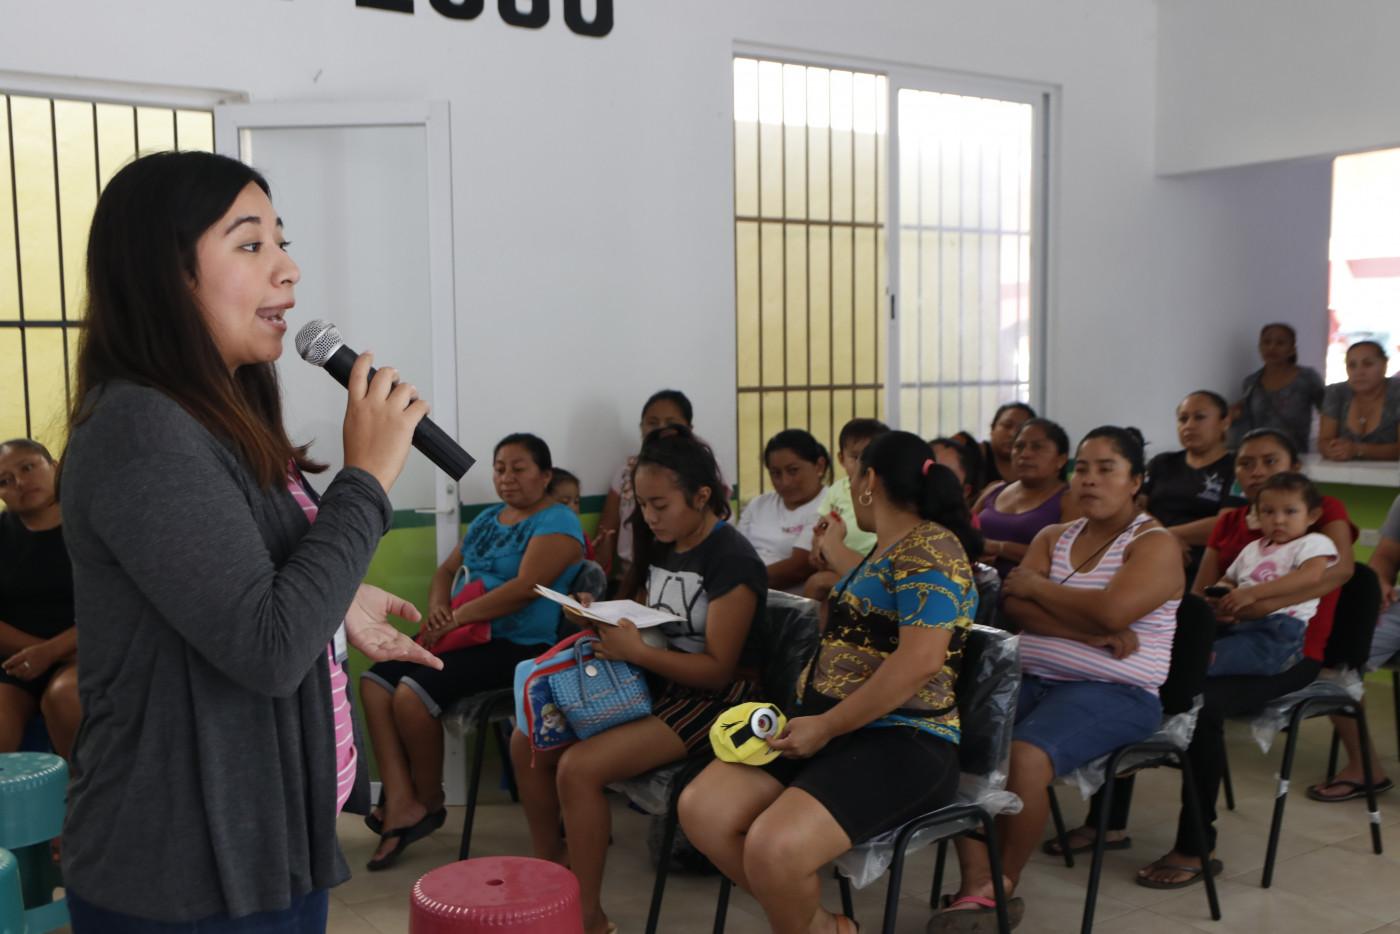 Visita a la primaria Francisco Javier Mina en el municipio de Quintana Roo